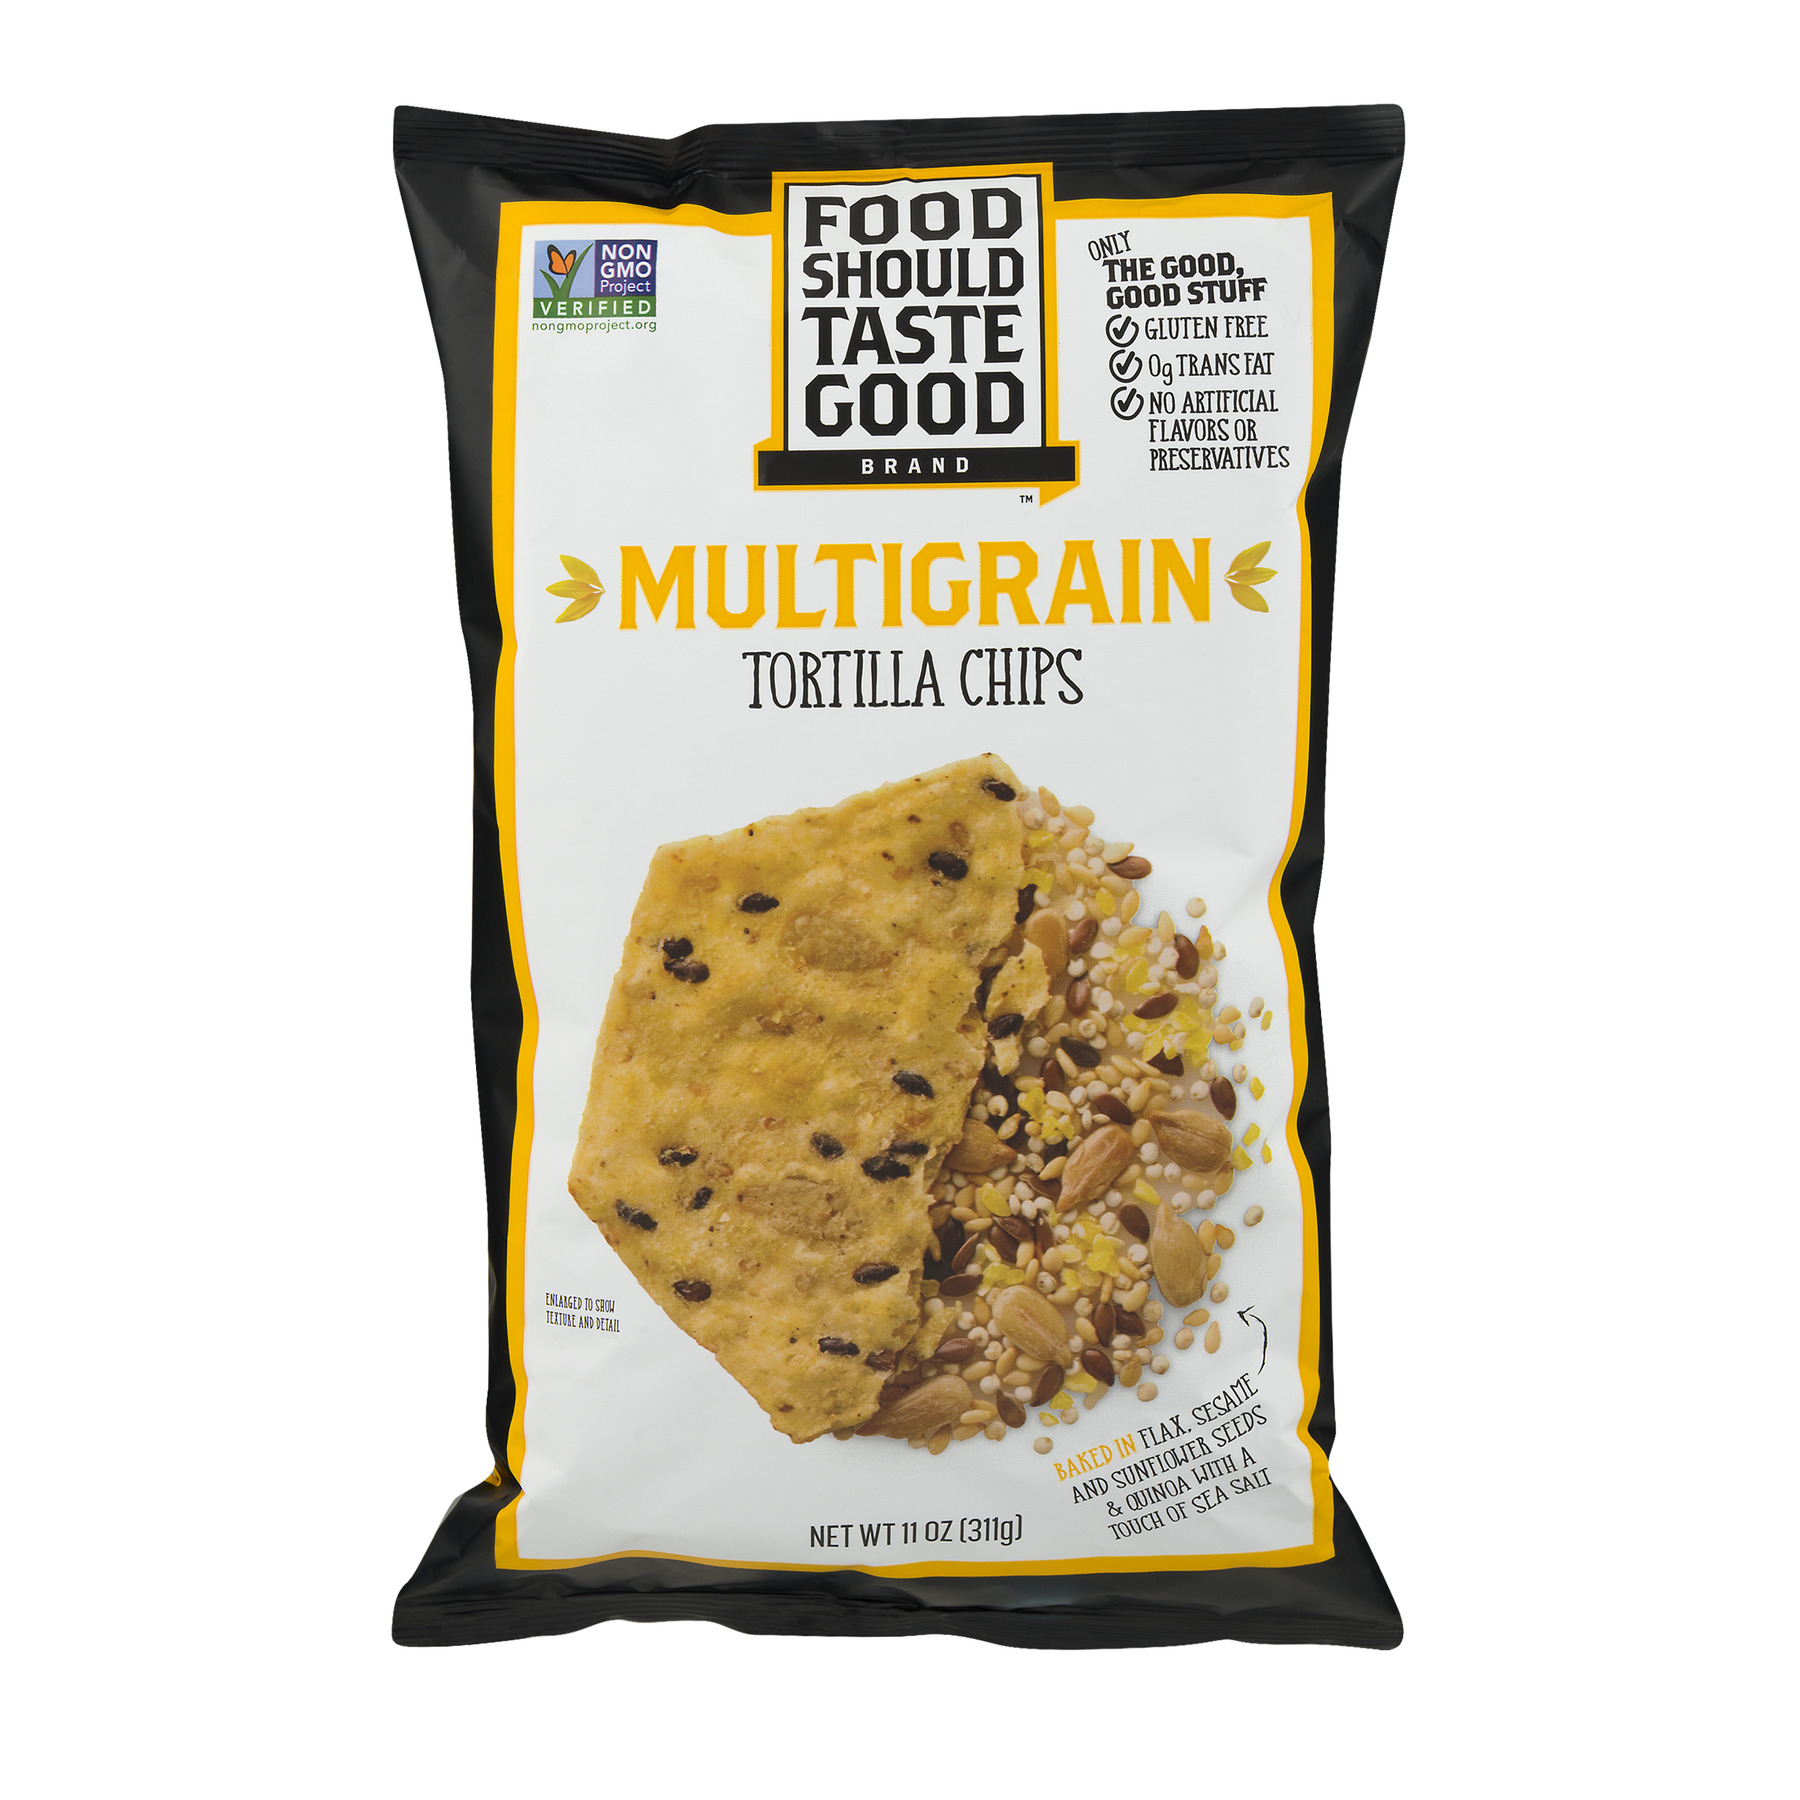 Food Should Taste Good All Natural Tortilla Chips Multigrain